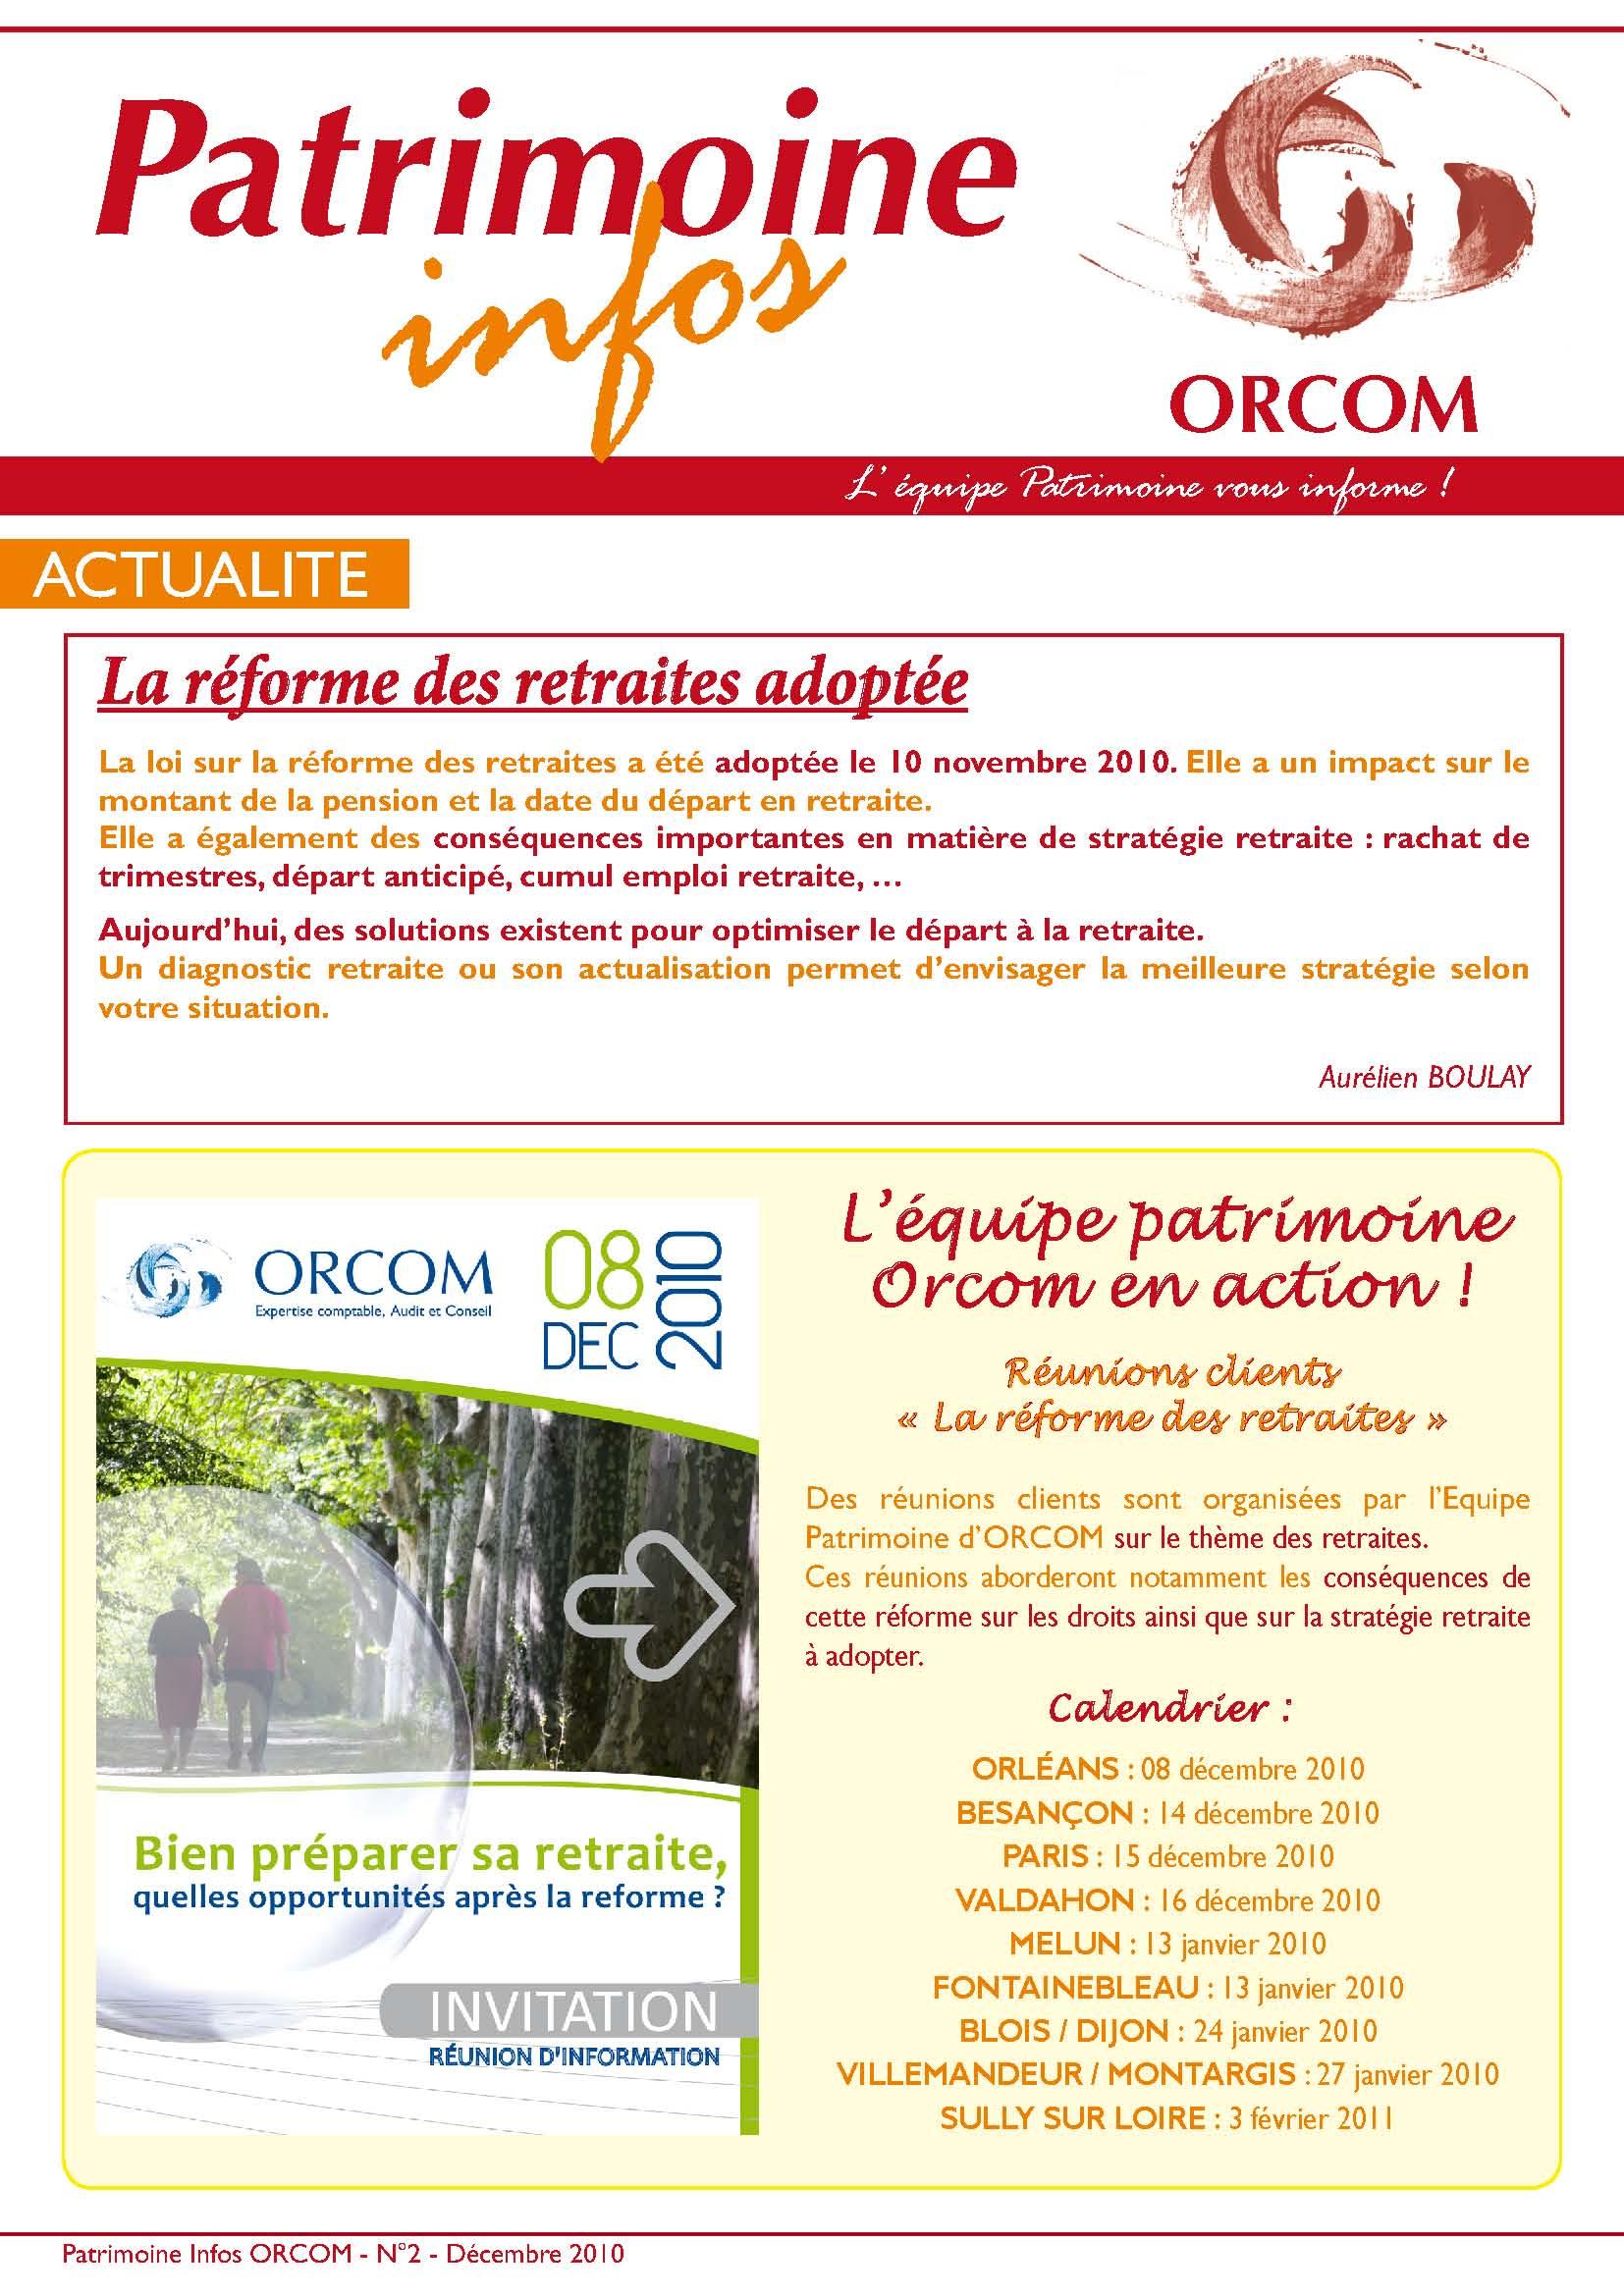 orcom-patrimoine-infos-n2-dec2010